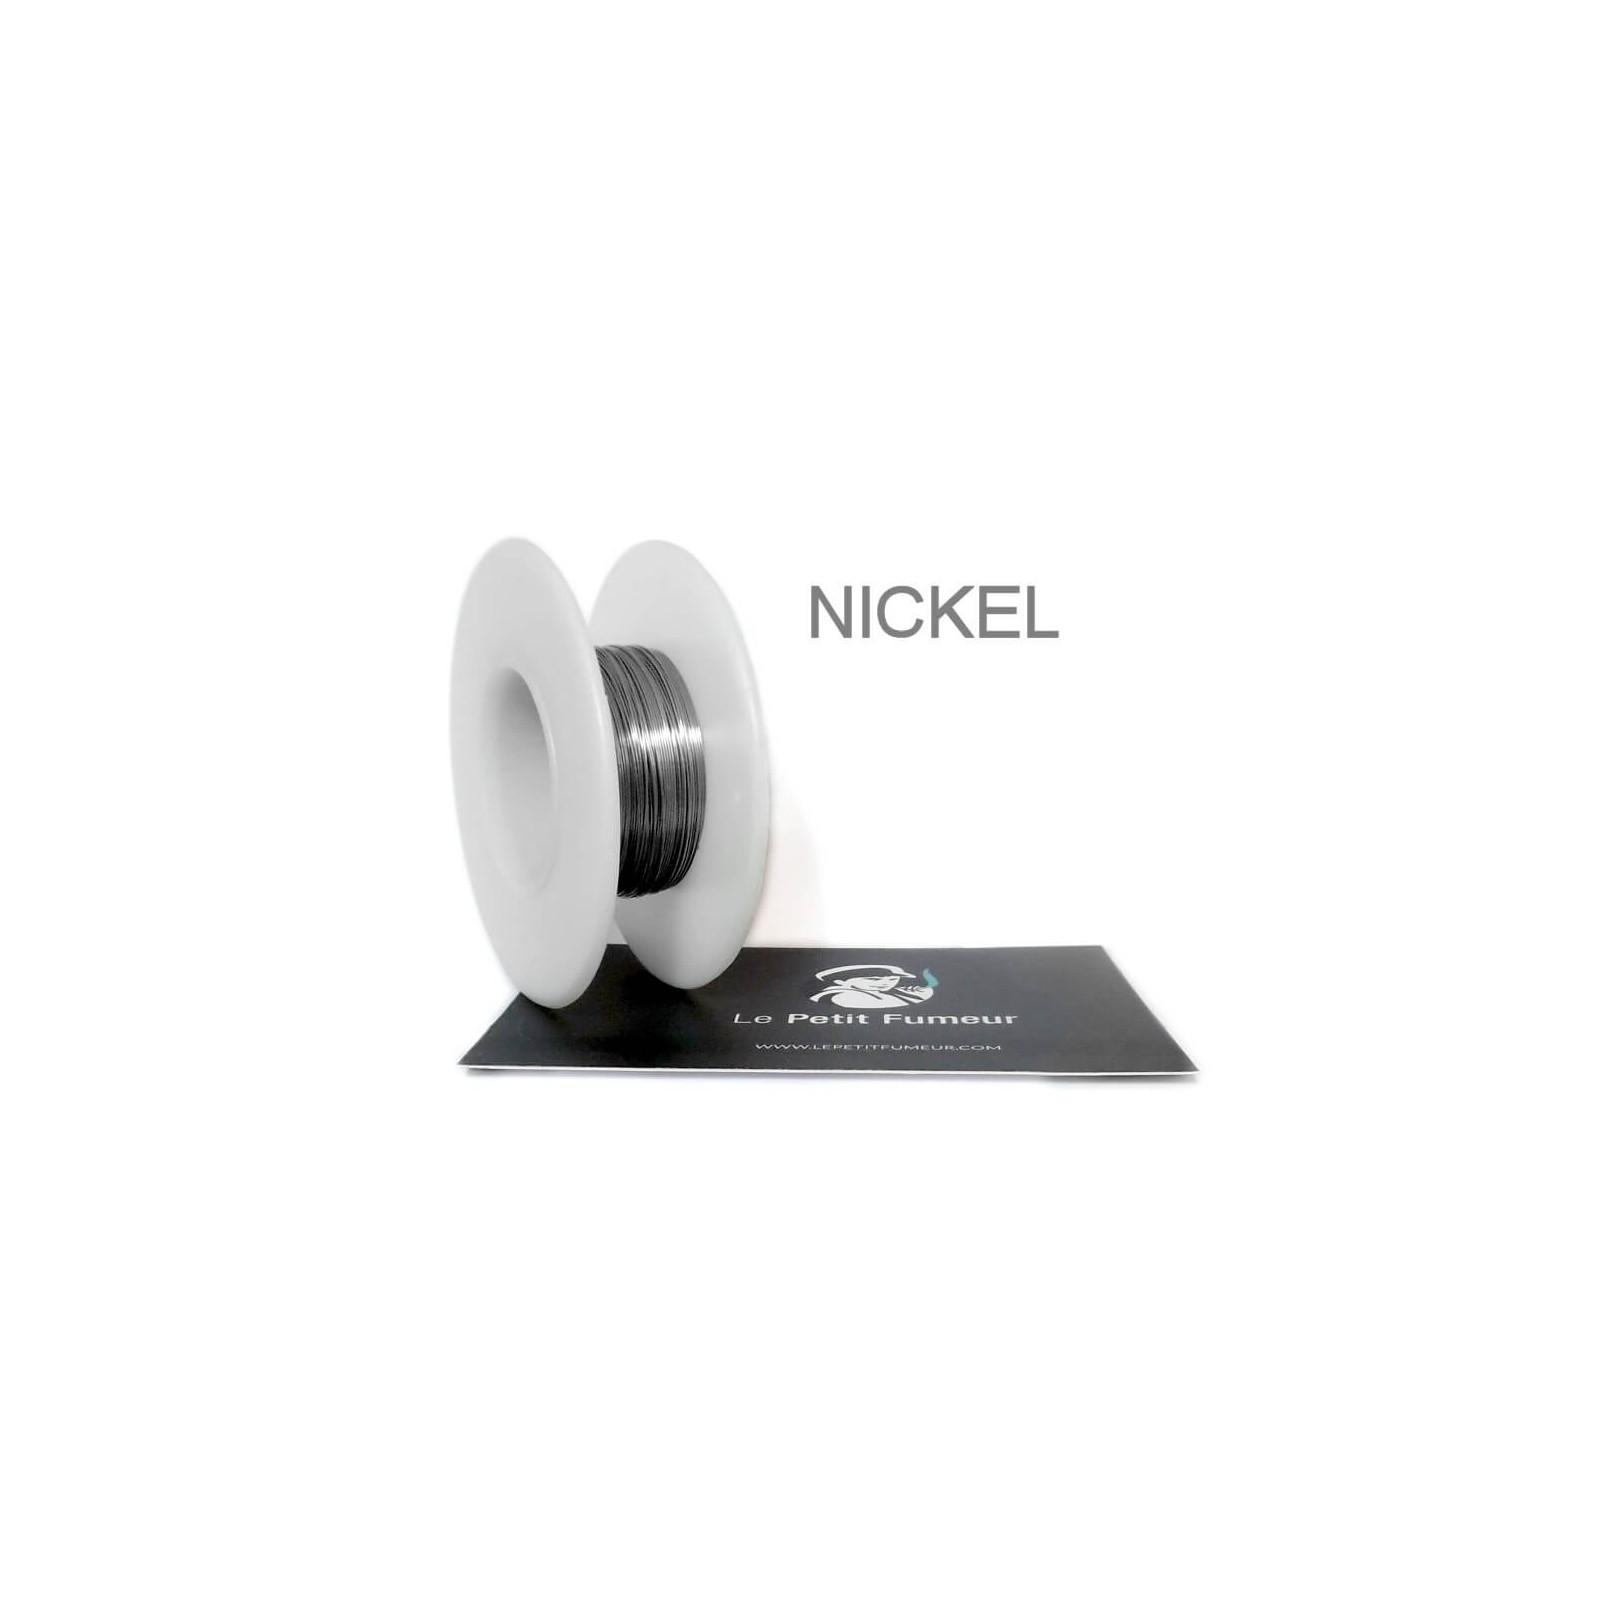 Nickel Ni200 - LE PETIT FUMEUR